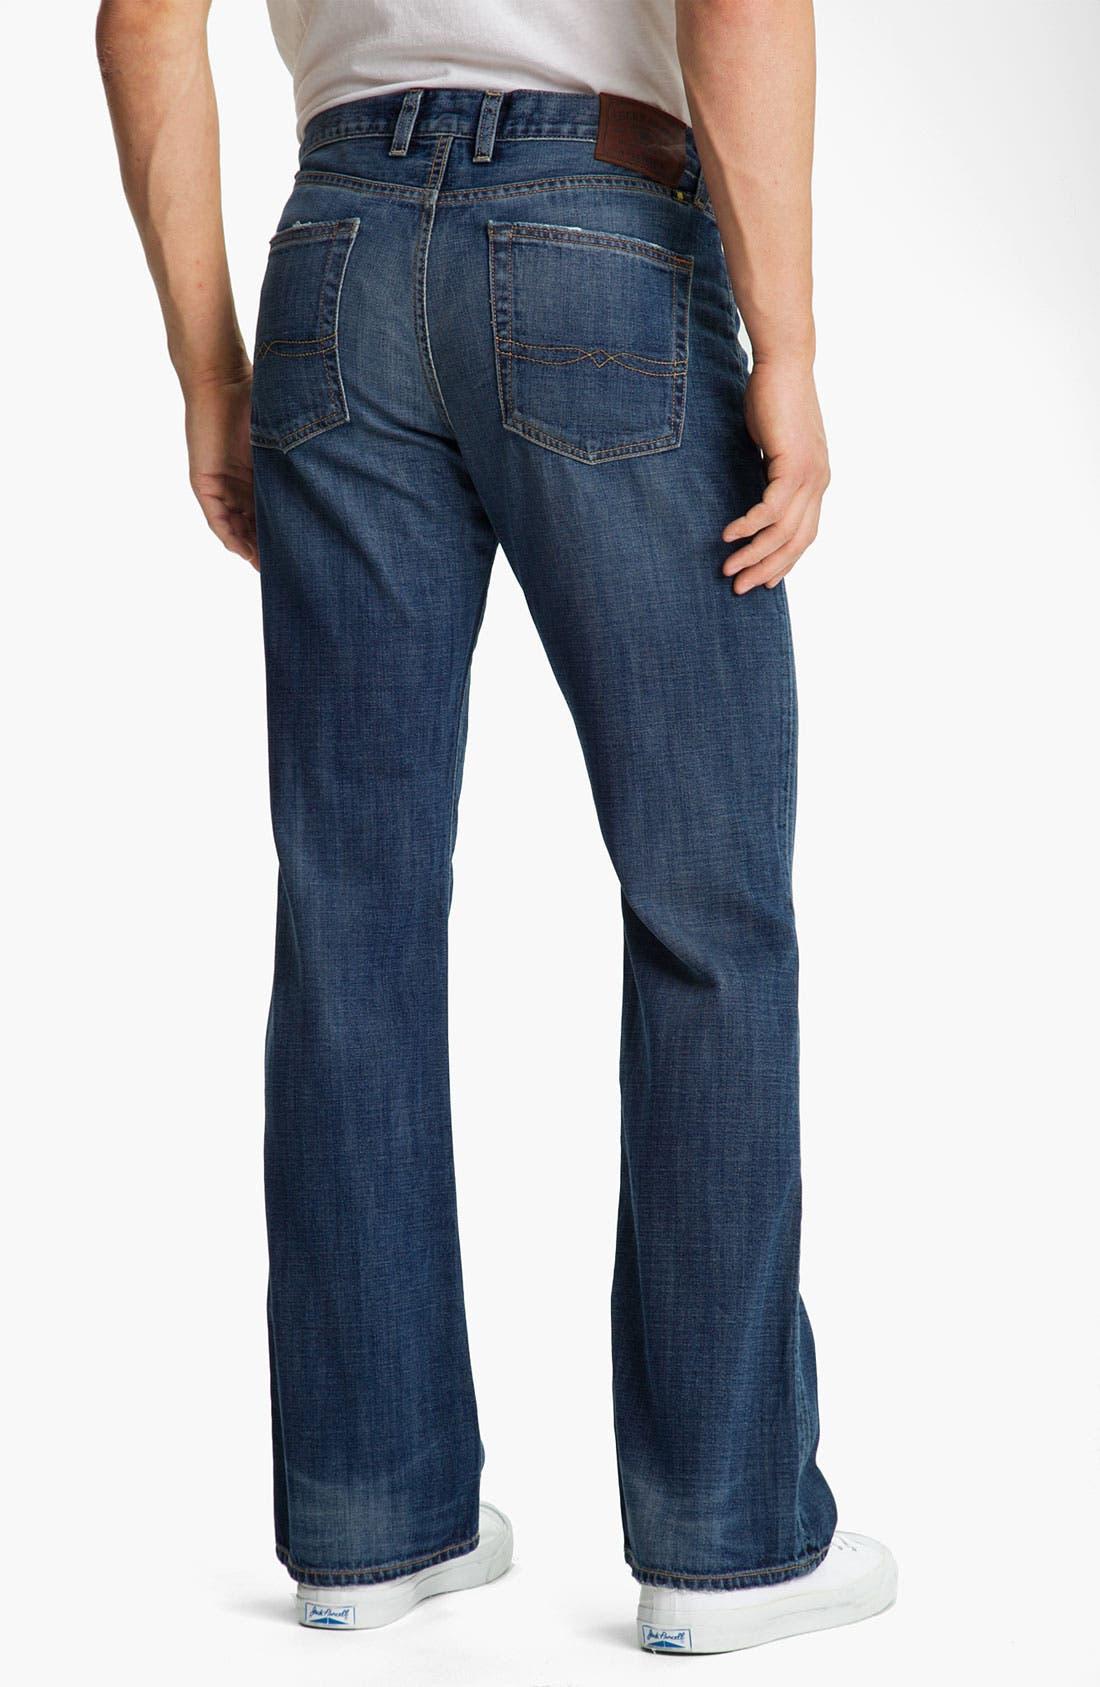 Alternate Image 2  - Lucky Brand Bootcut Jeans (Medium Edwin Warner)